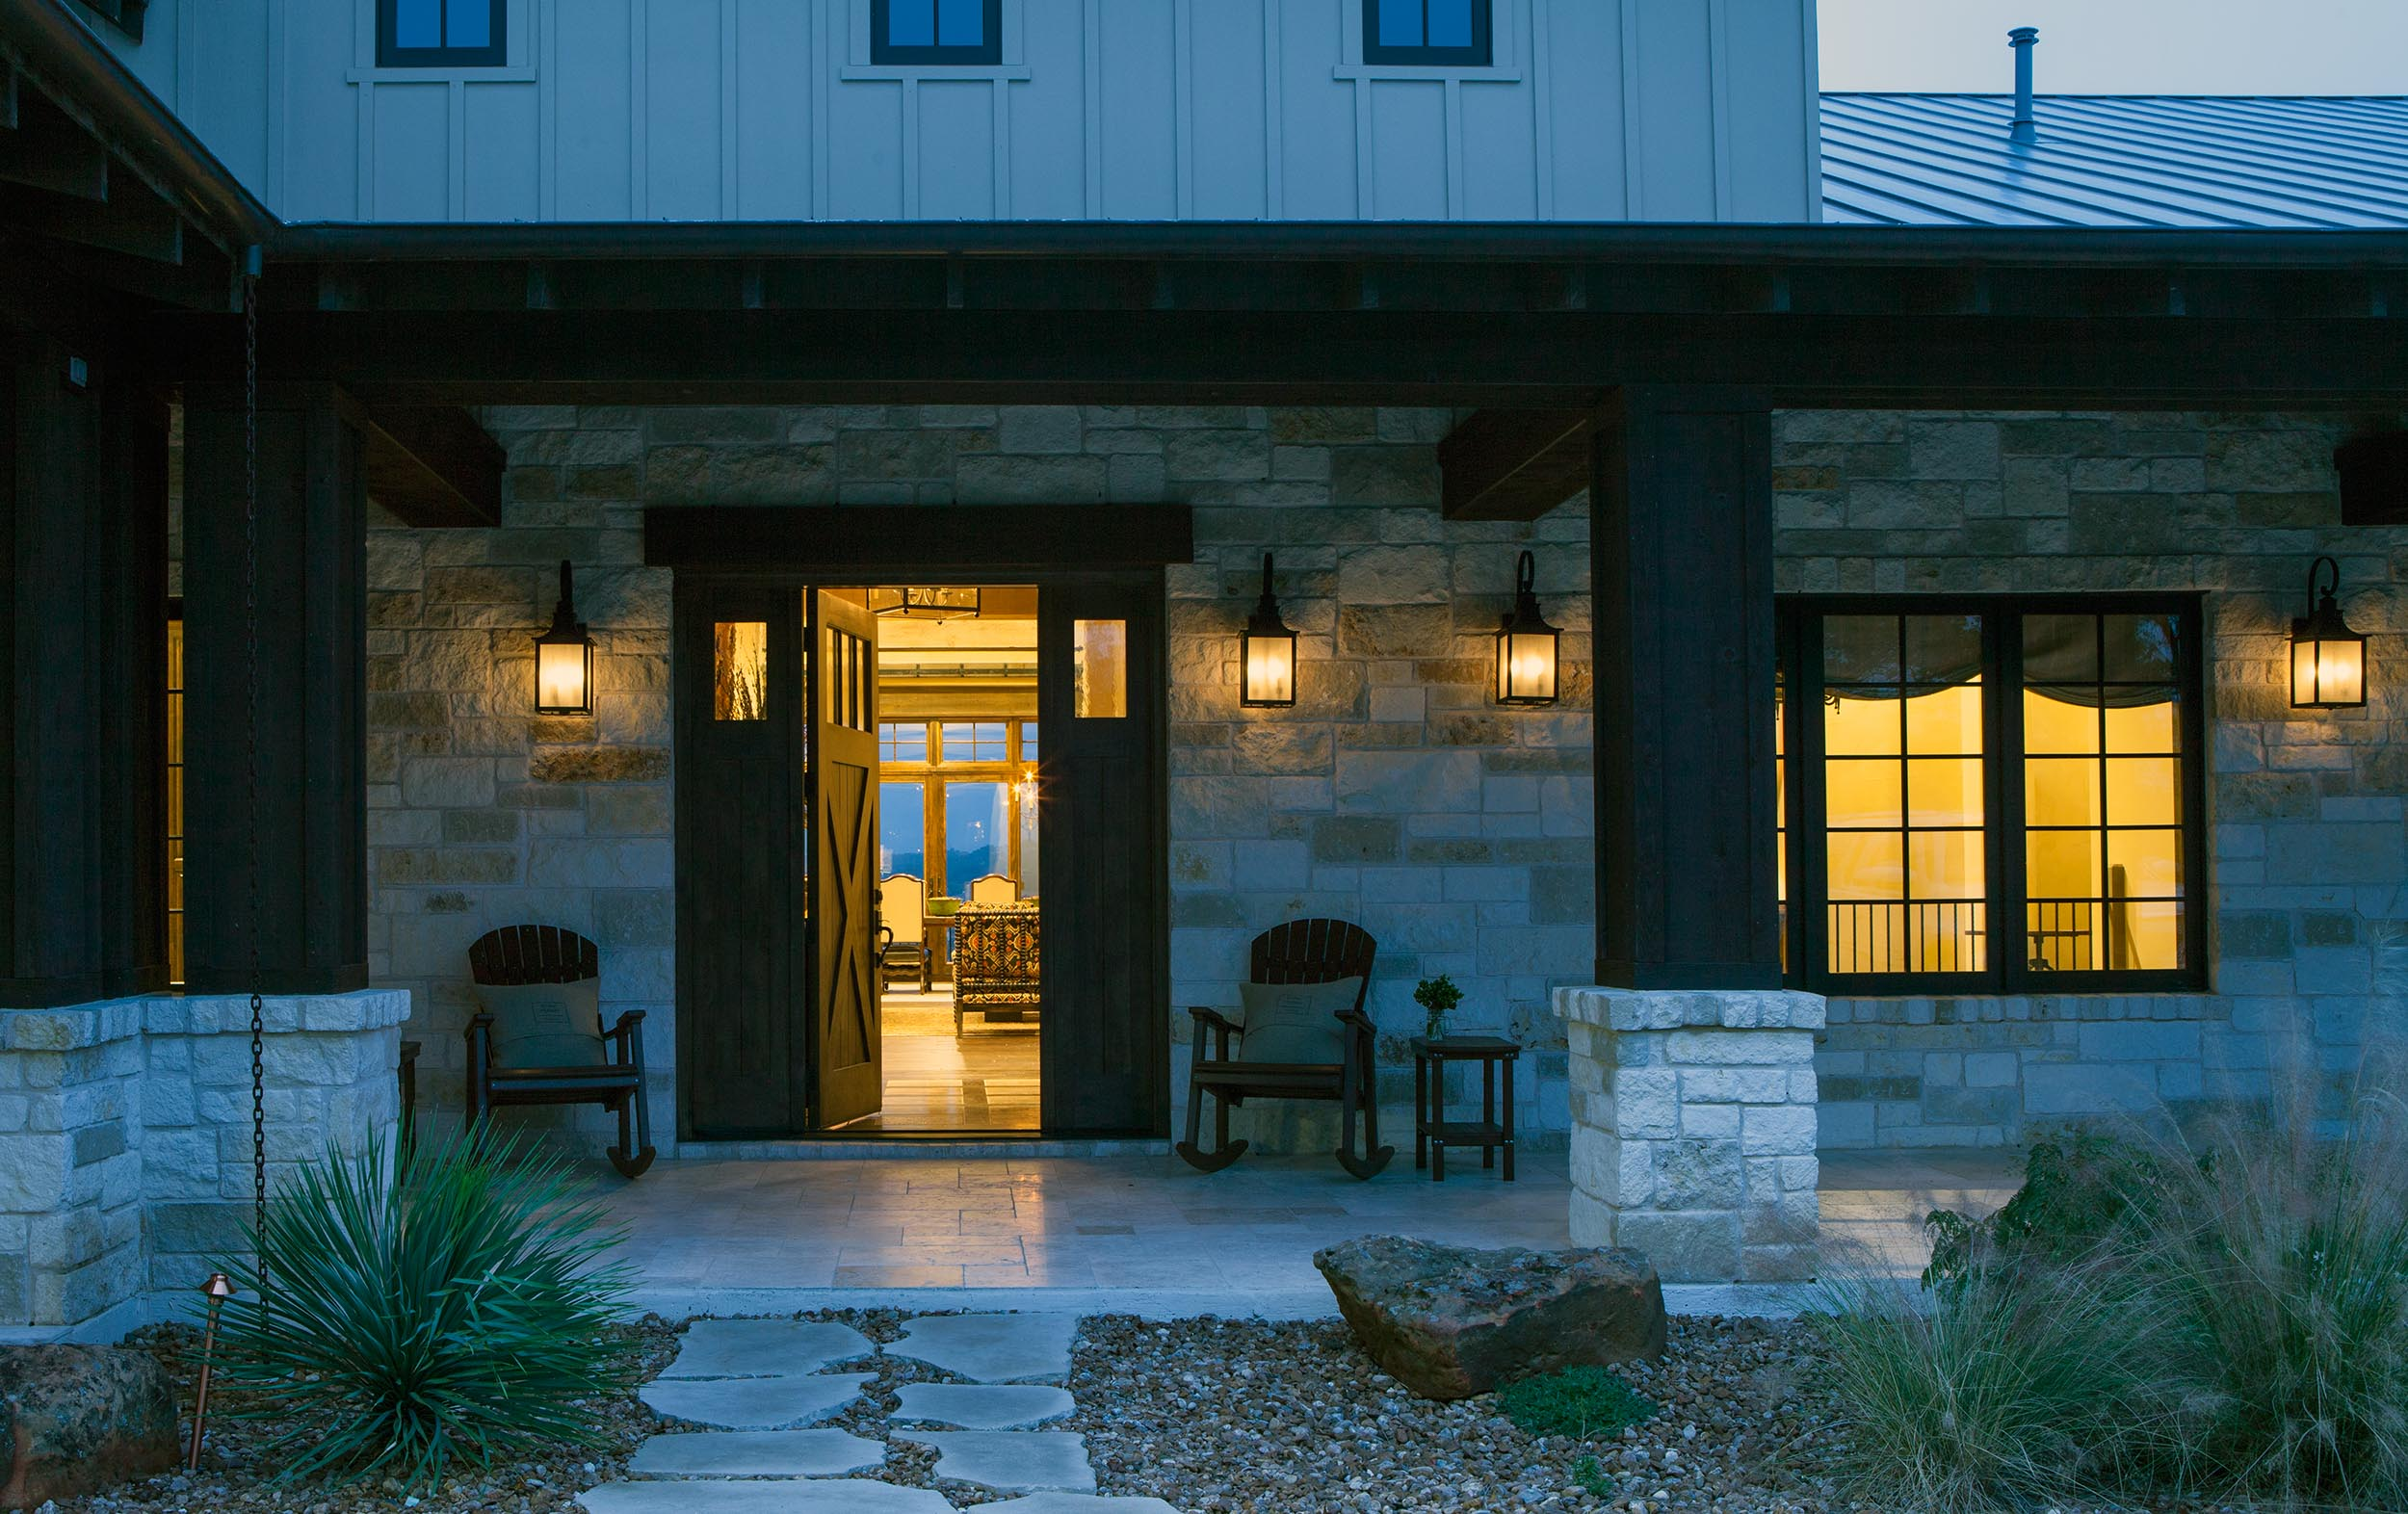 austin-house-exterior-front-interior-design.jpg